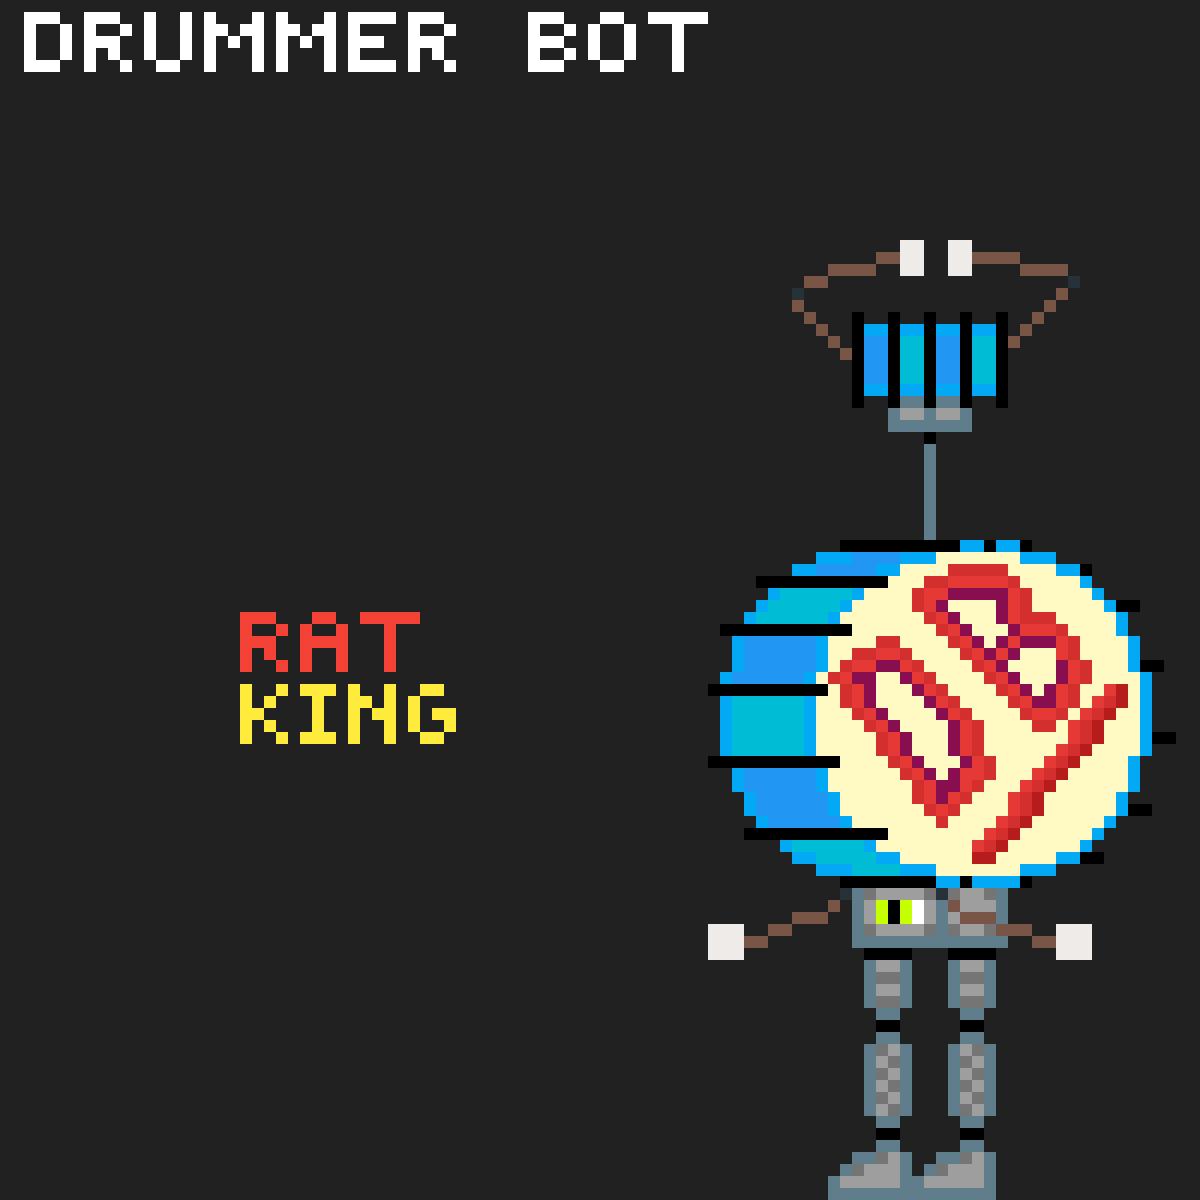 Drummer Bot by Rat-King